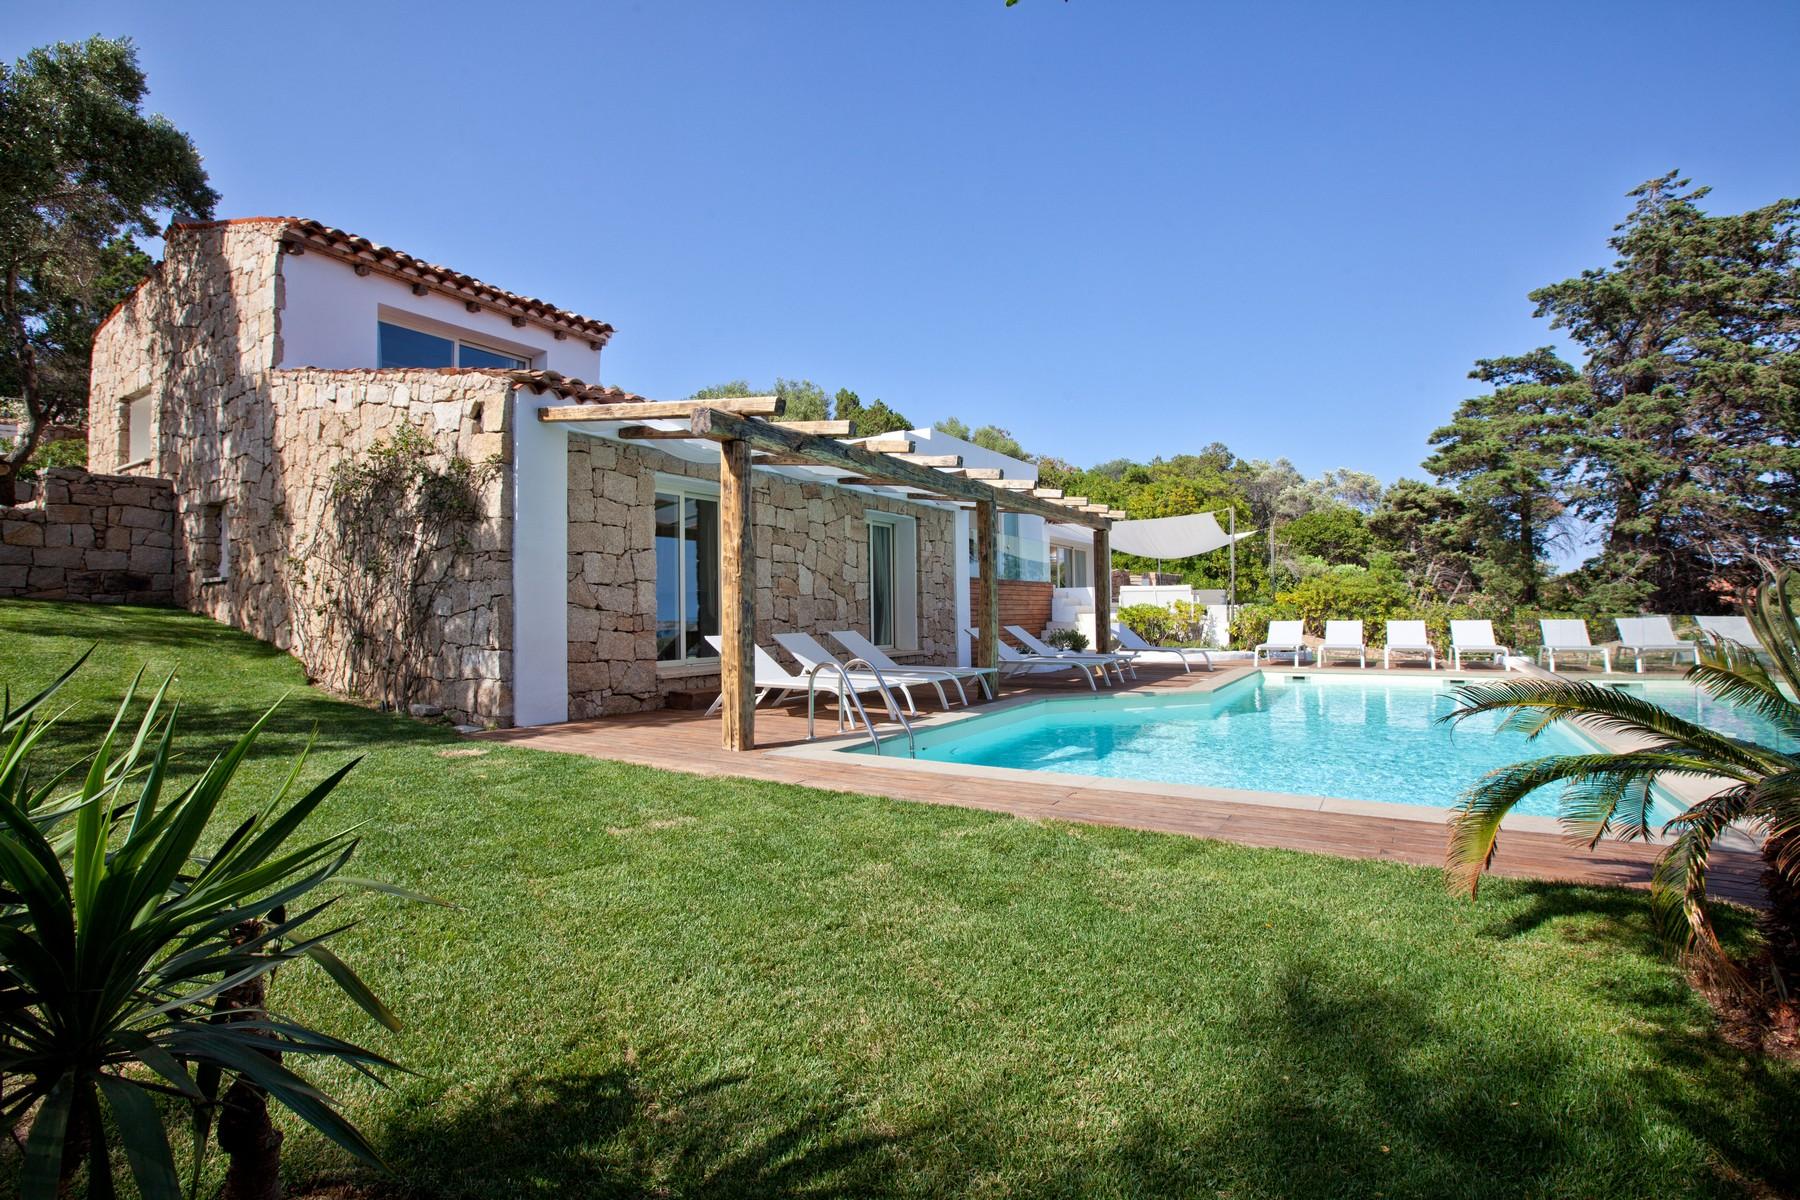 Other Residential for Sale at Magnificent Villa on the Pevero Hills Porto Cervo, Olbia Tempio, Italy